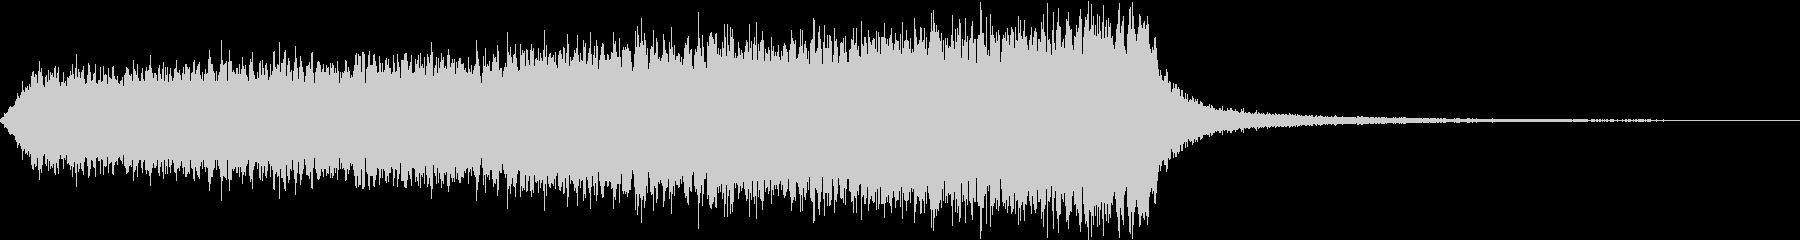 CINEMATIC RISER_23の未再生の波形